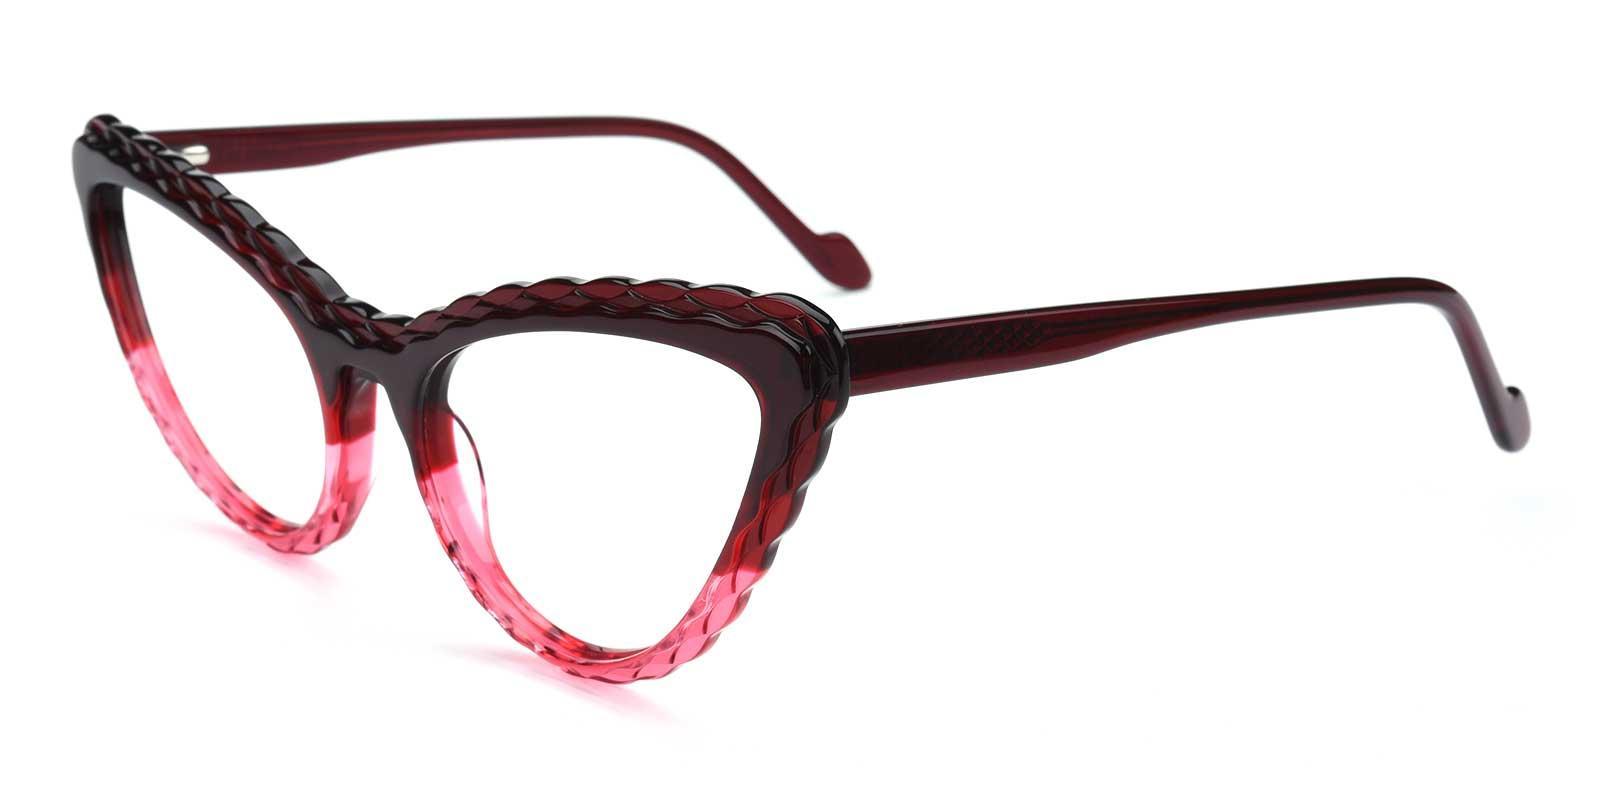 Barry-Purple-Cat-Acetate-Eyeglasses-detail